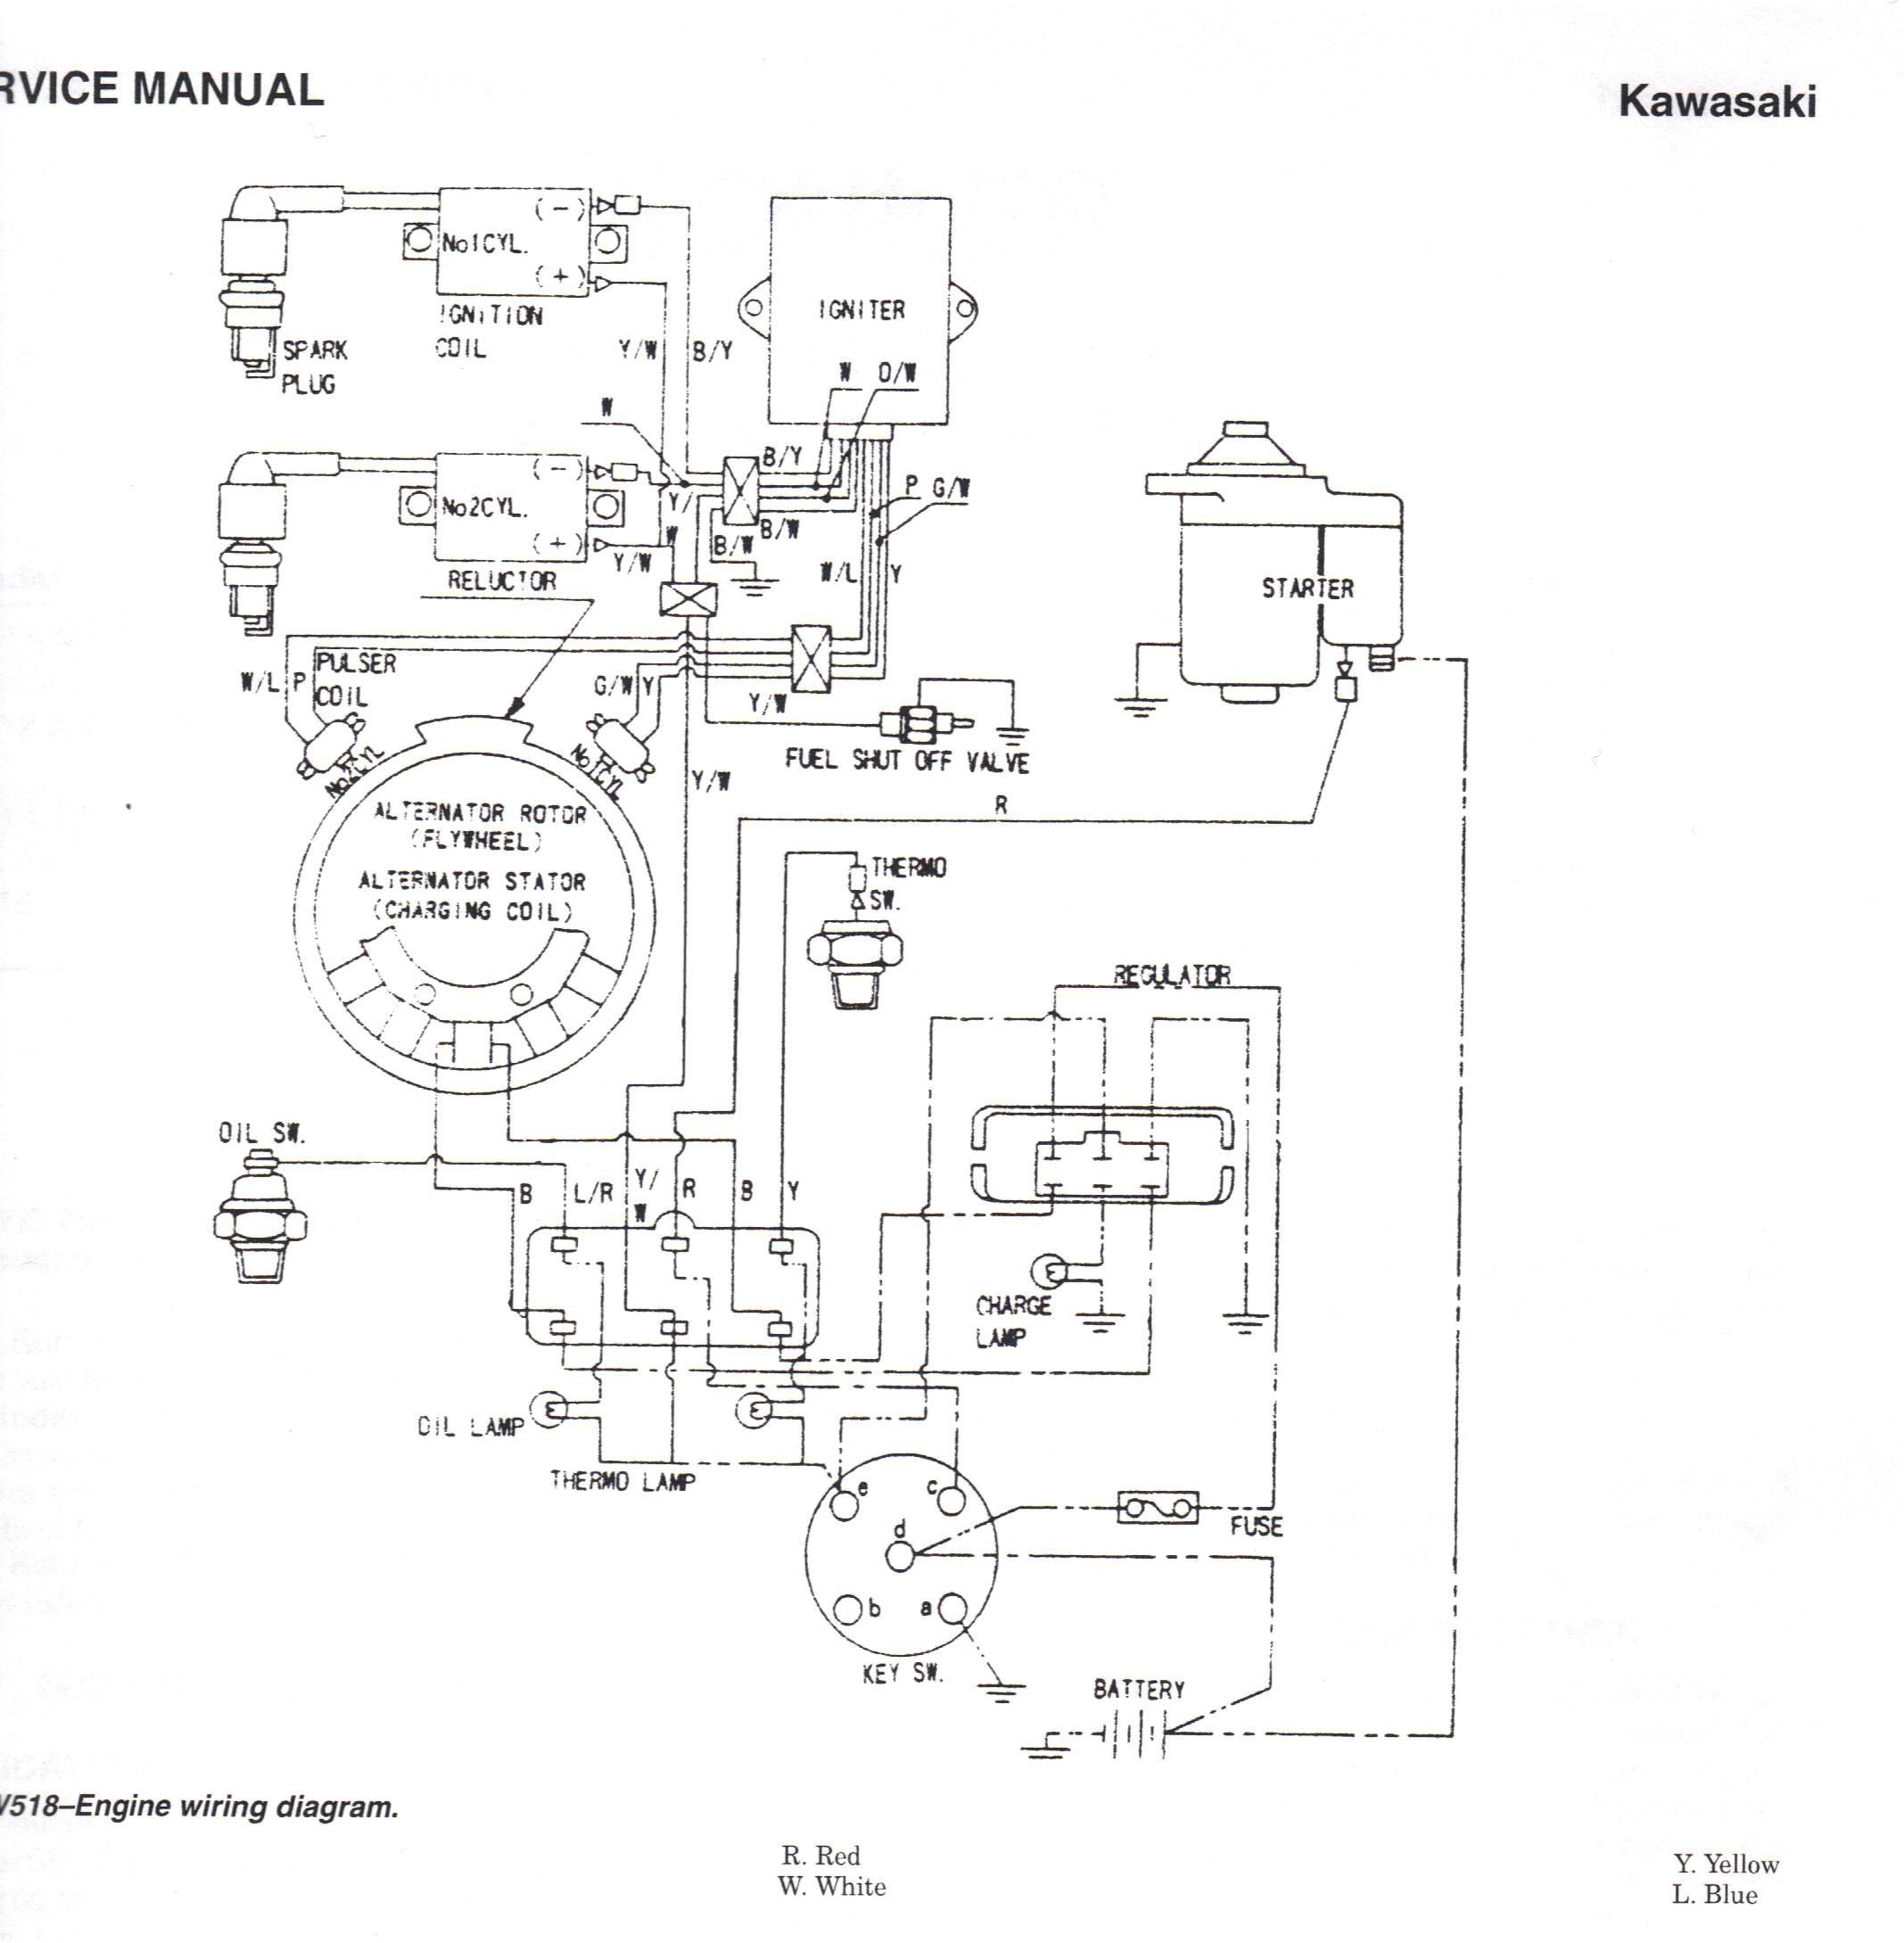 john deere 345 parts manual